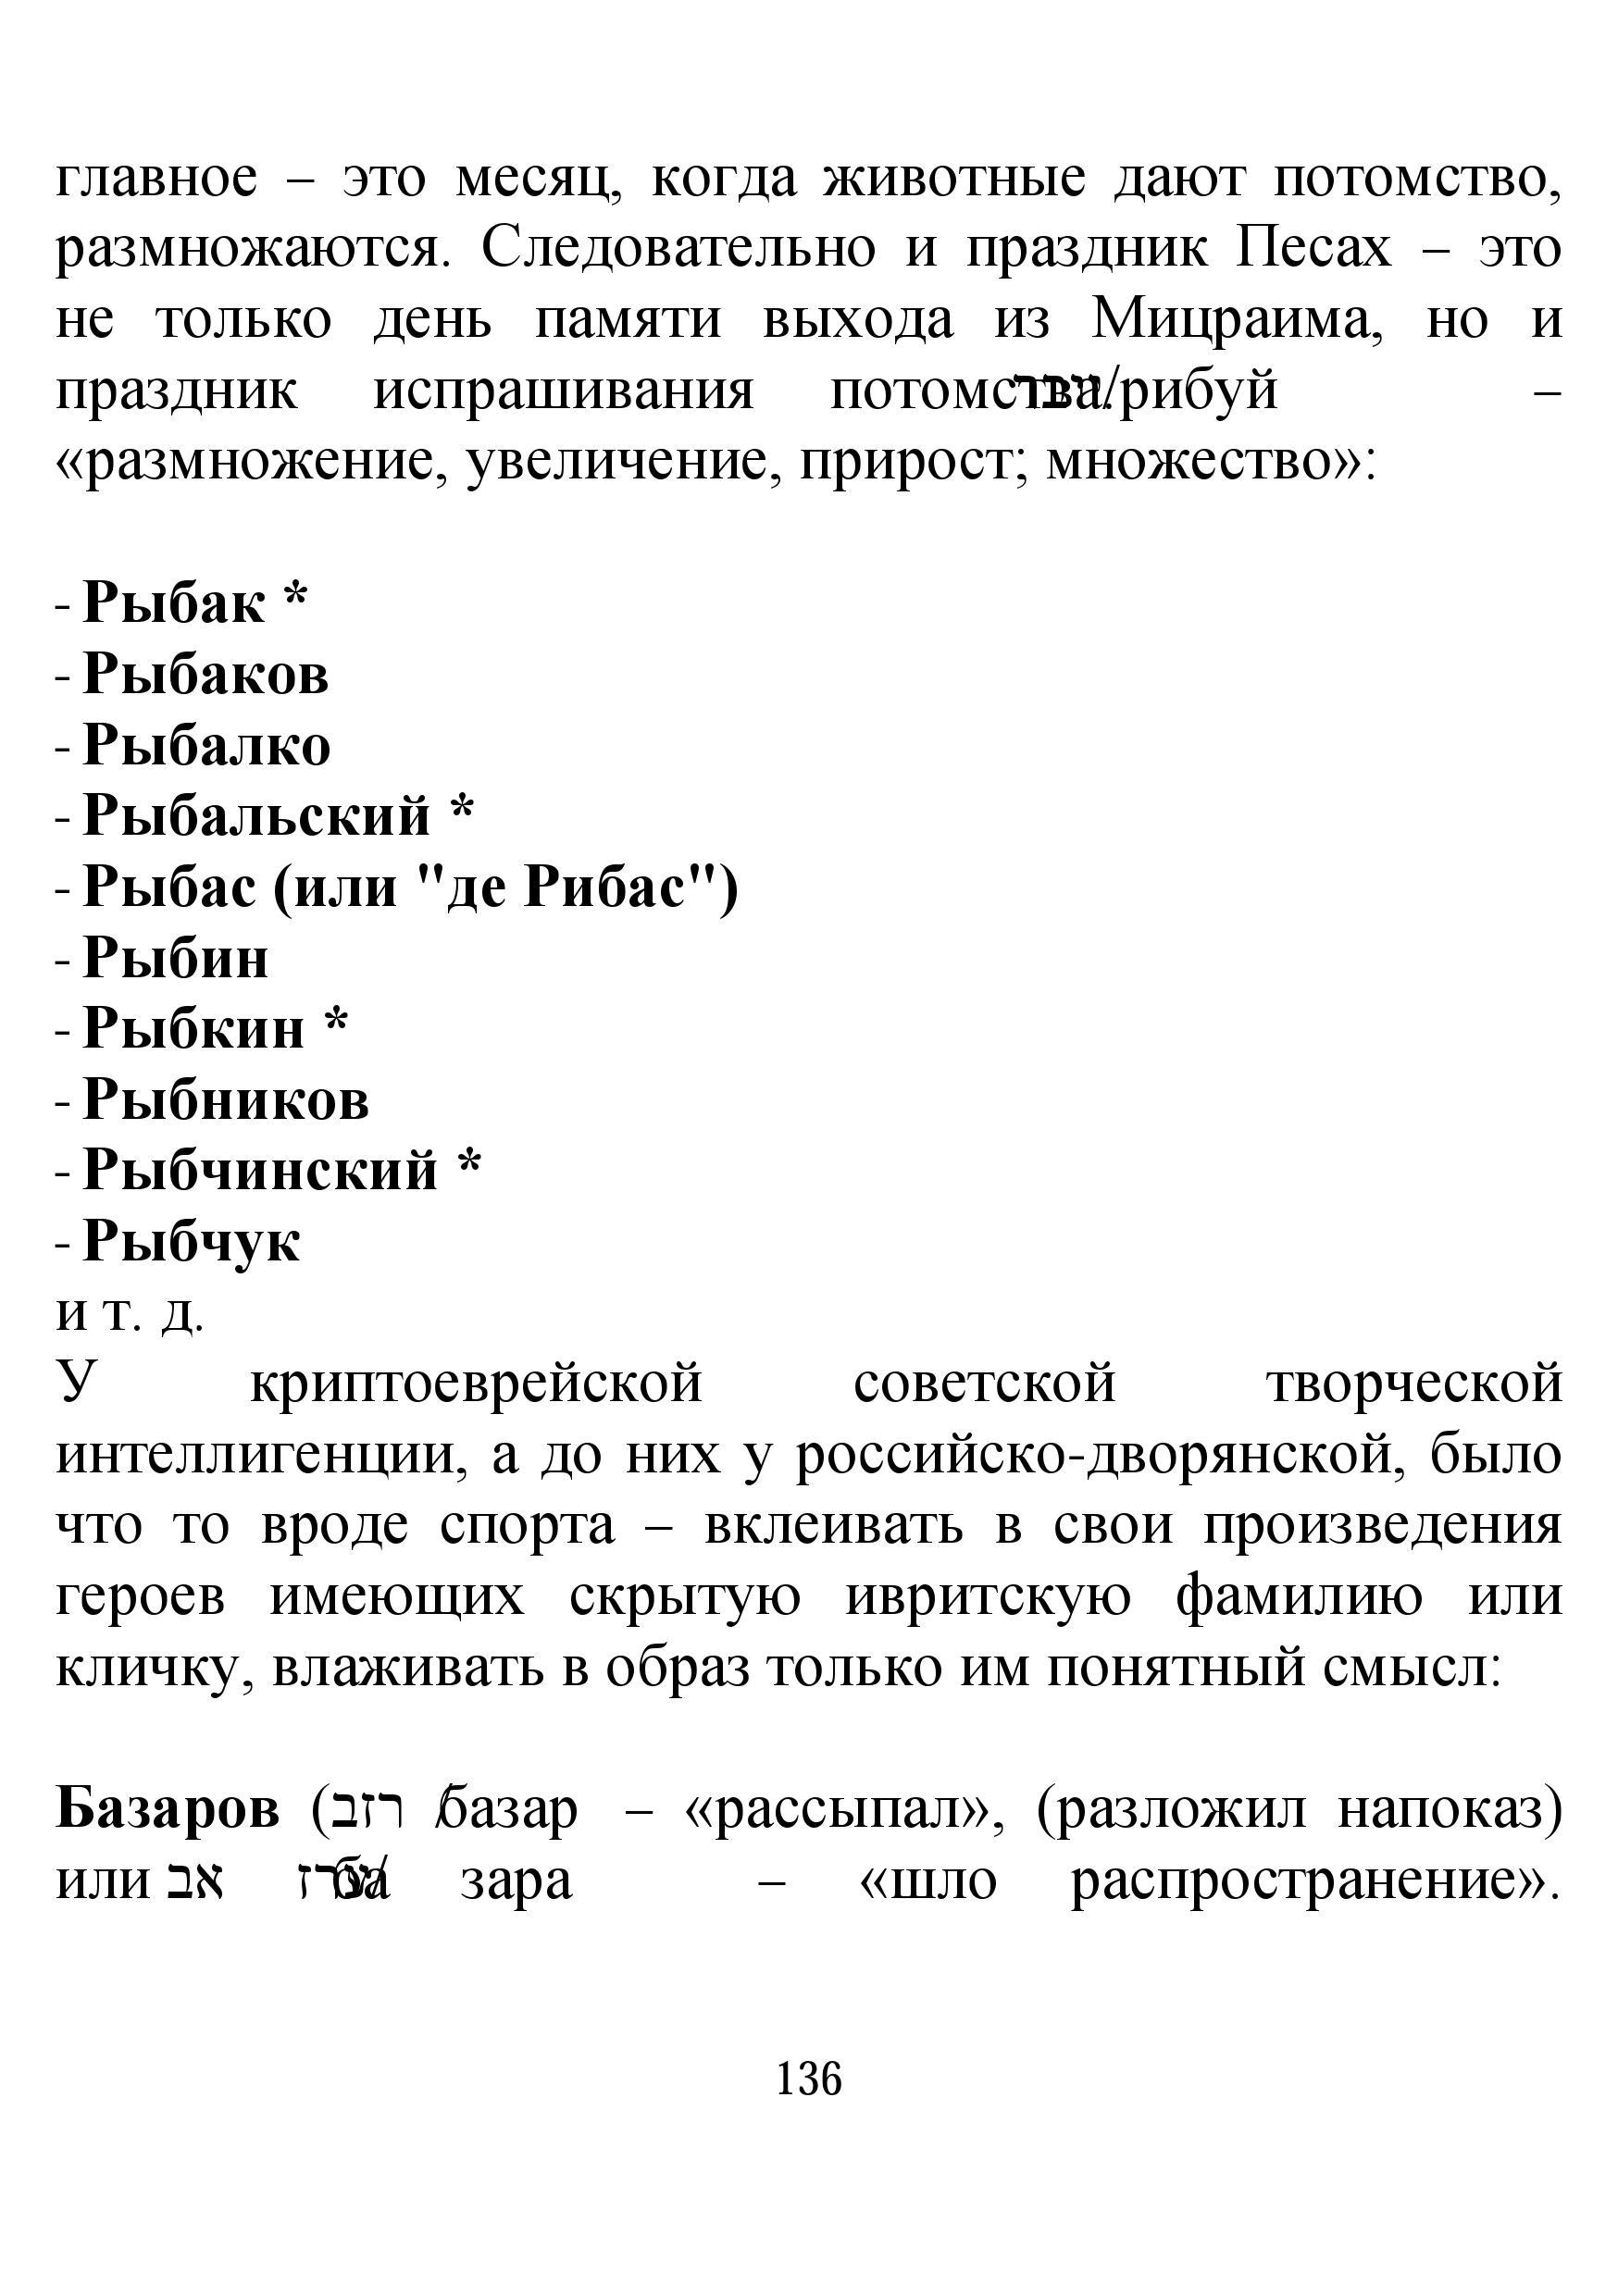 http://s4.uploads.ru/SDzIi.jpg